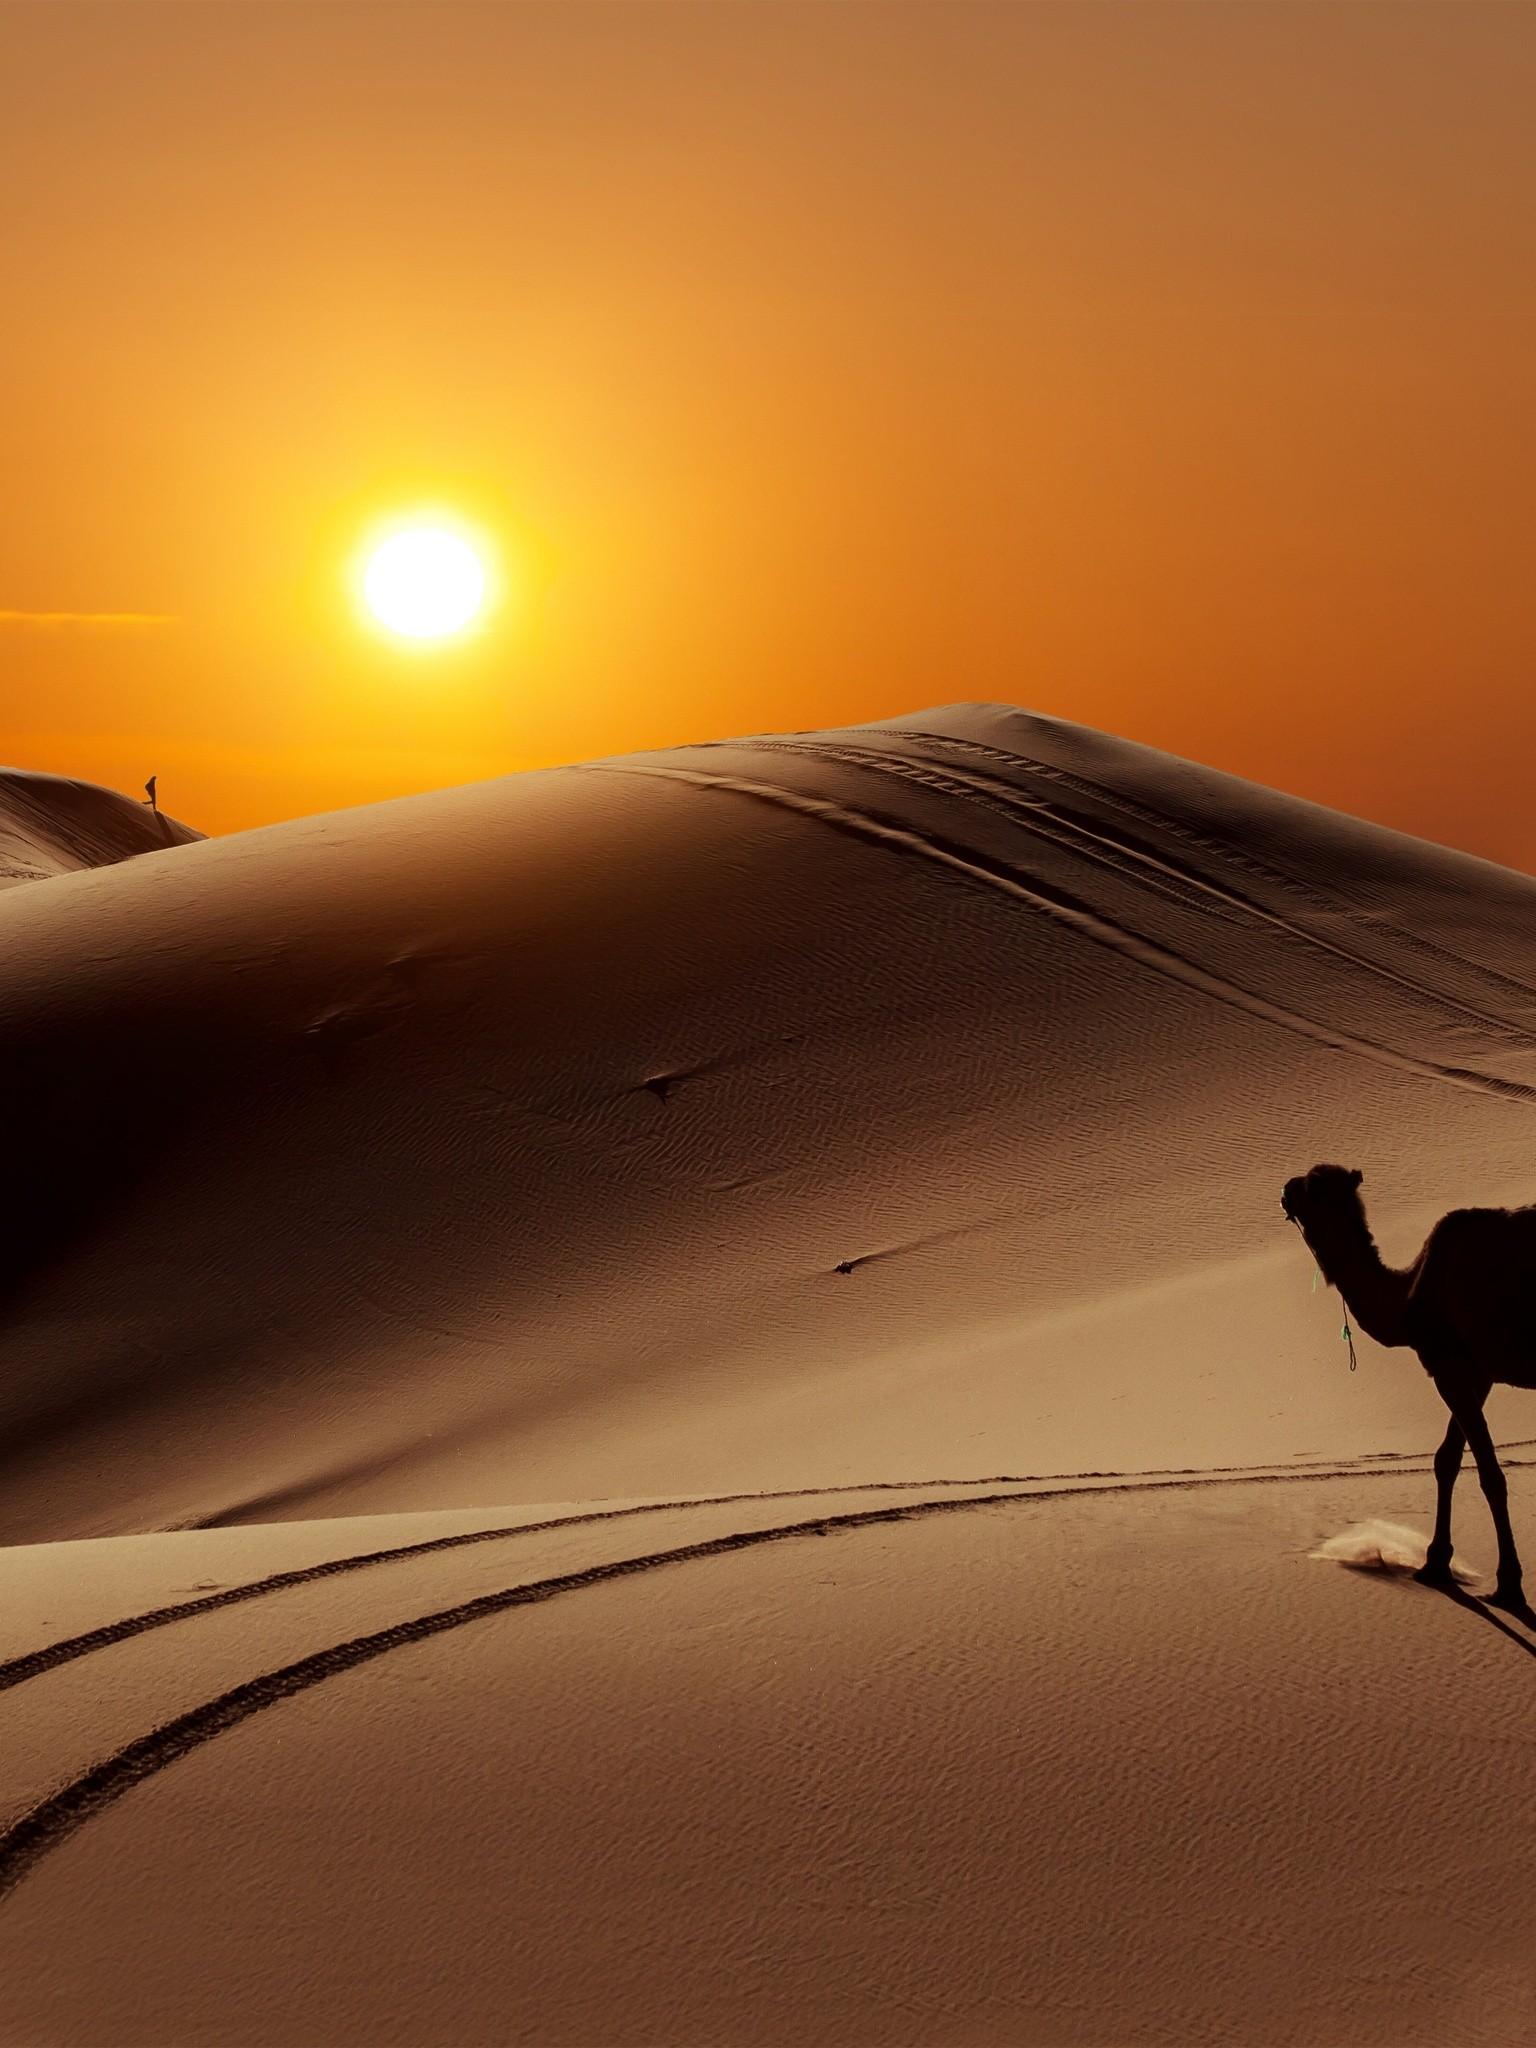 Sun People Desert Camel Wallpaper 1536x2048